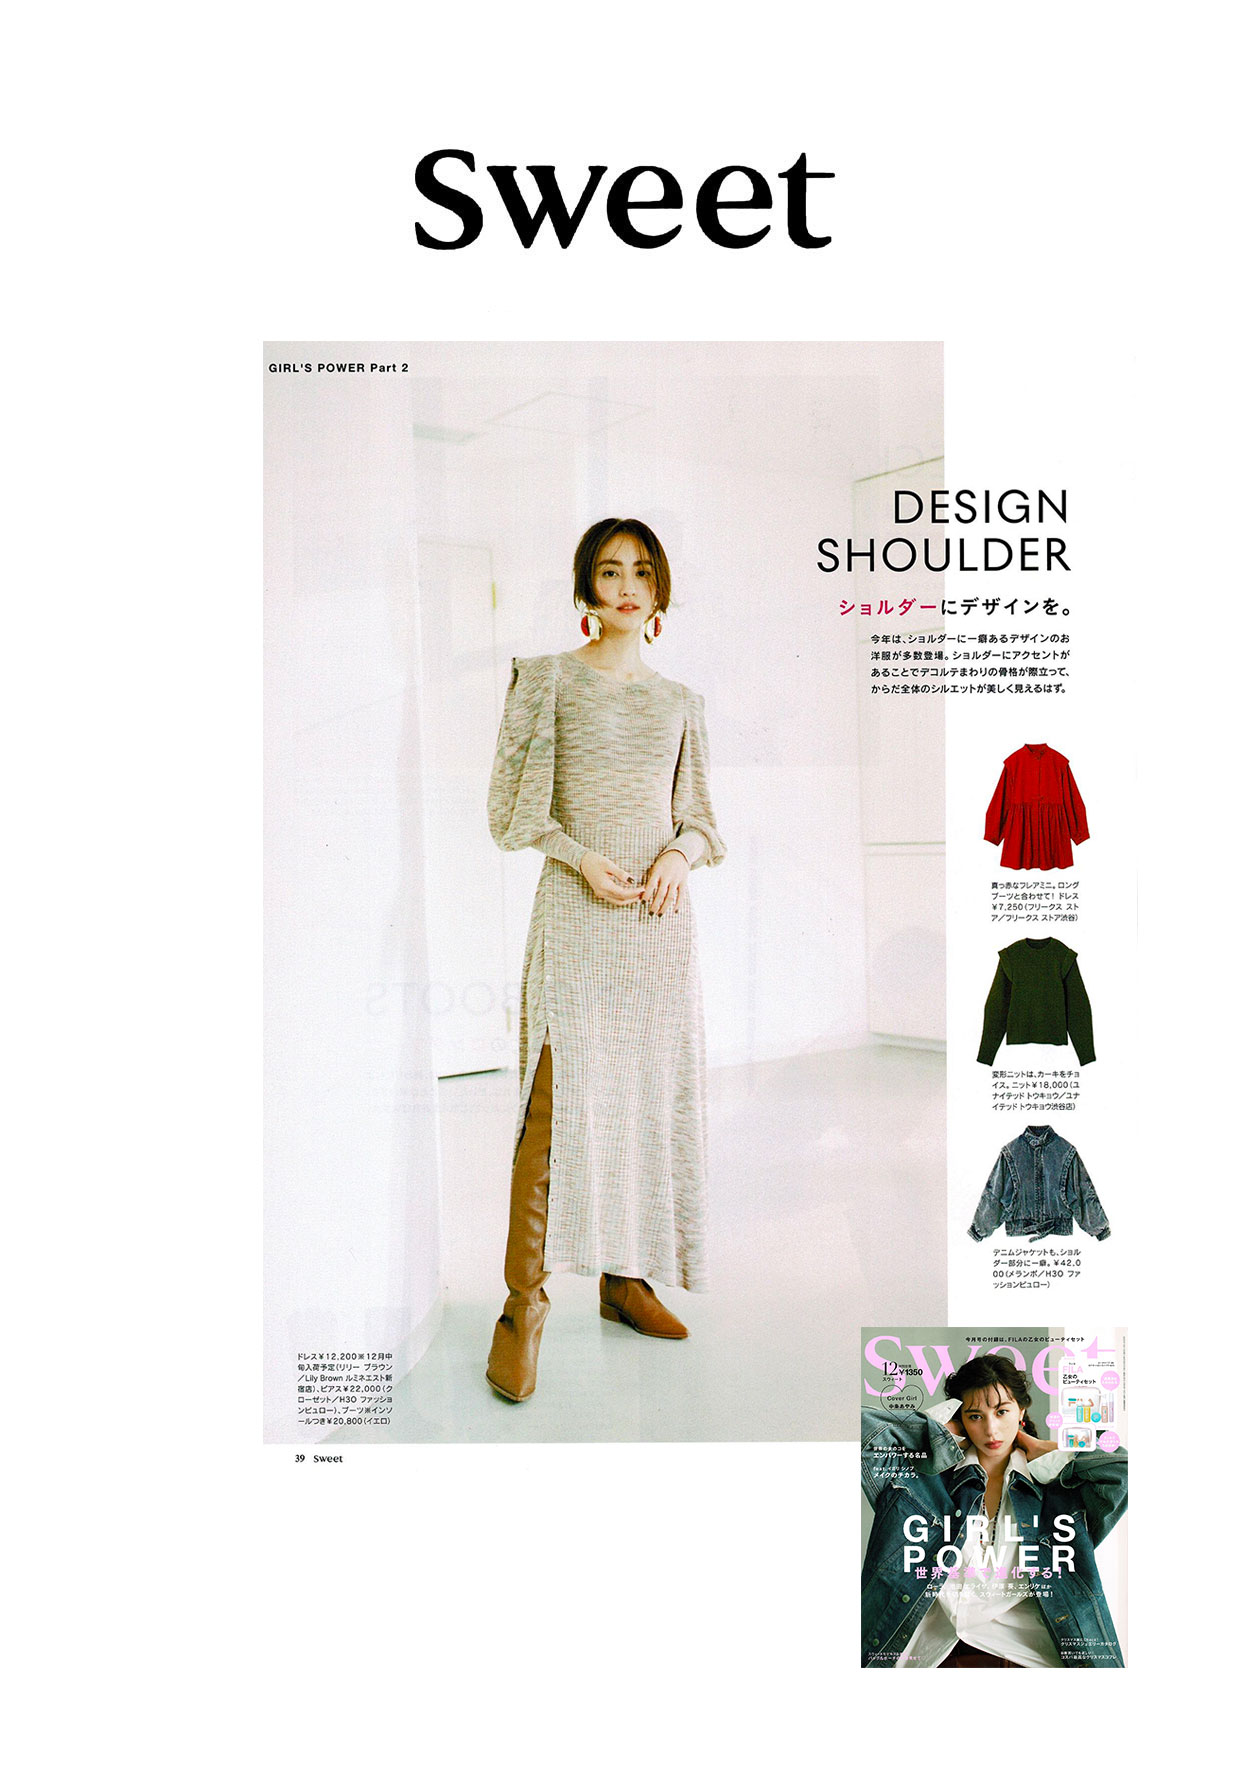 melampo-press-sweet-japan-magazine5